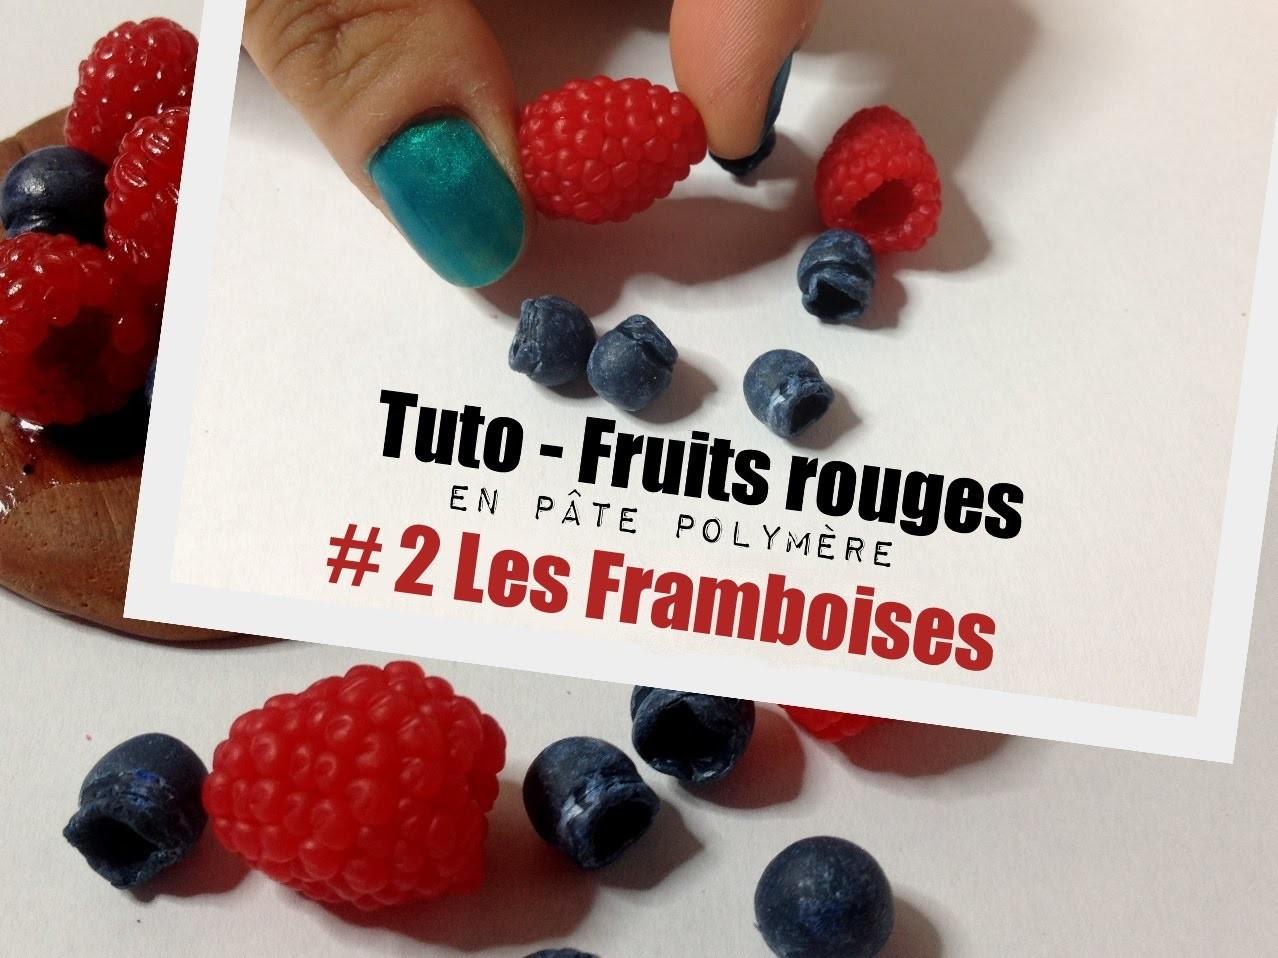 Tuto - Fruits rouges #2 Les framboises (polymer clay)